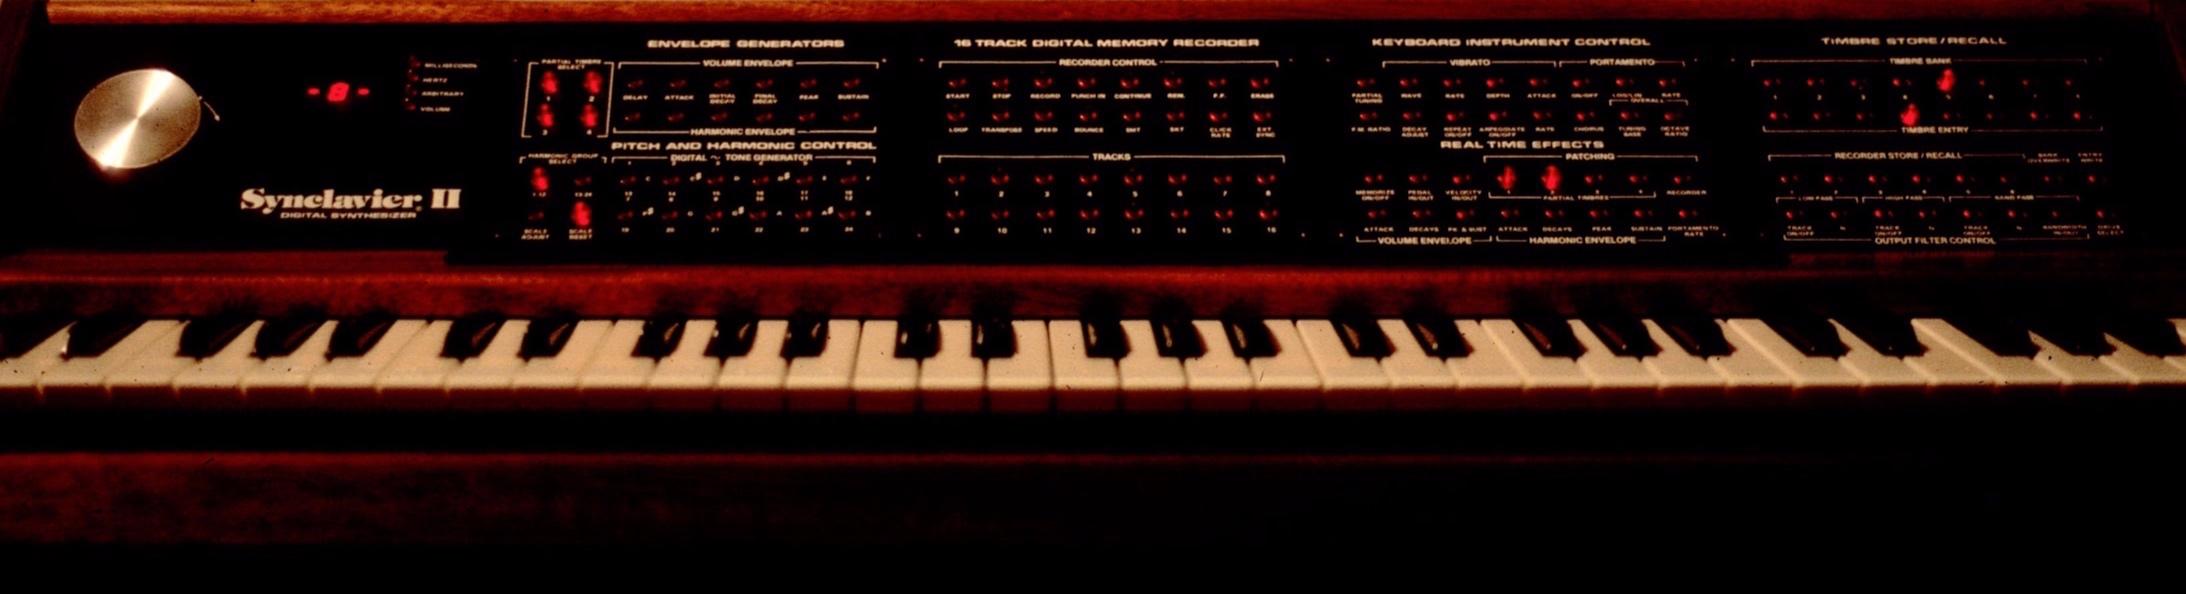 Original Synclavier mahogany keyboard.